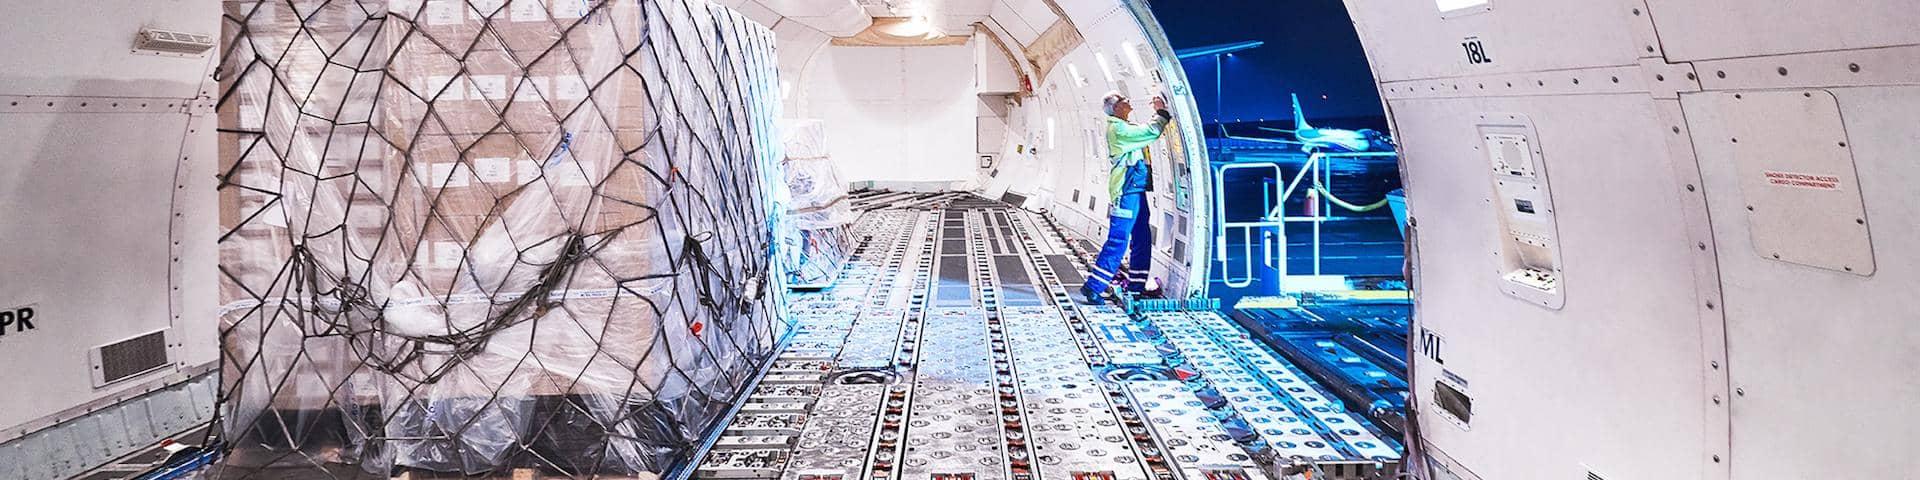 DB Schenker Air Freight Charter Services Airplane Inside